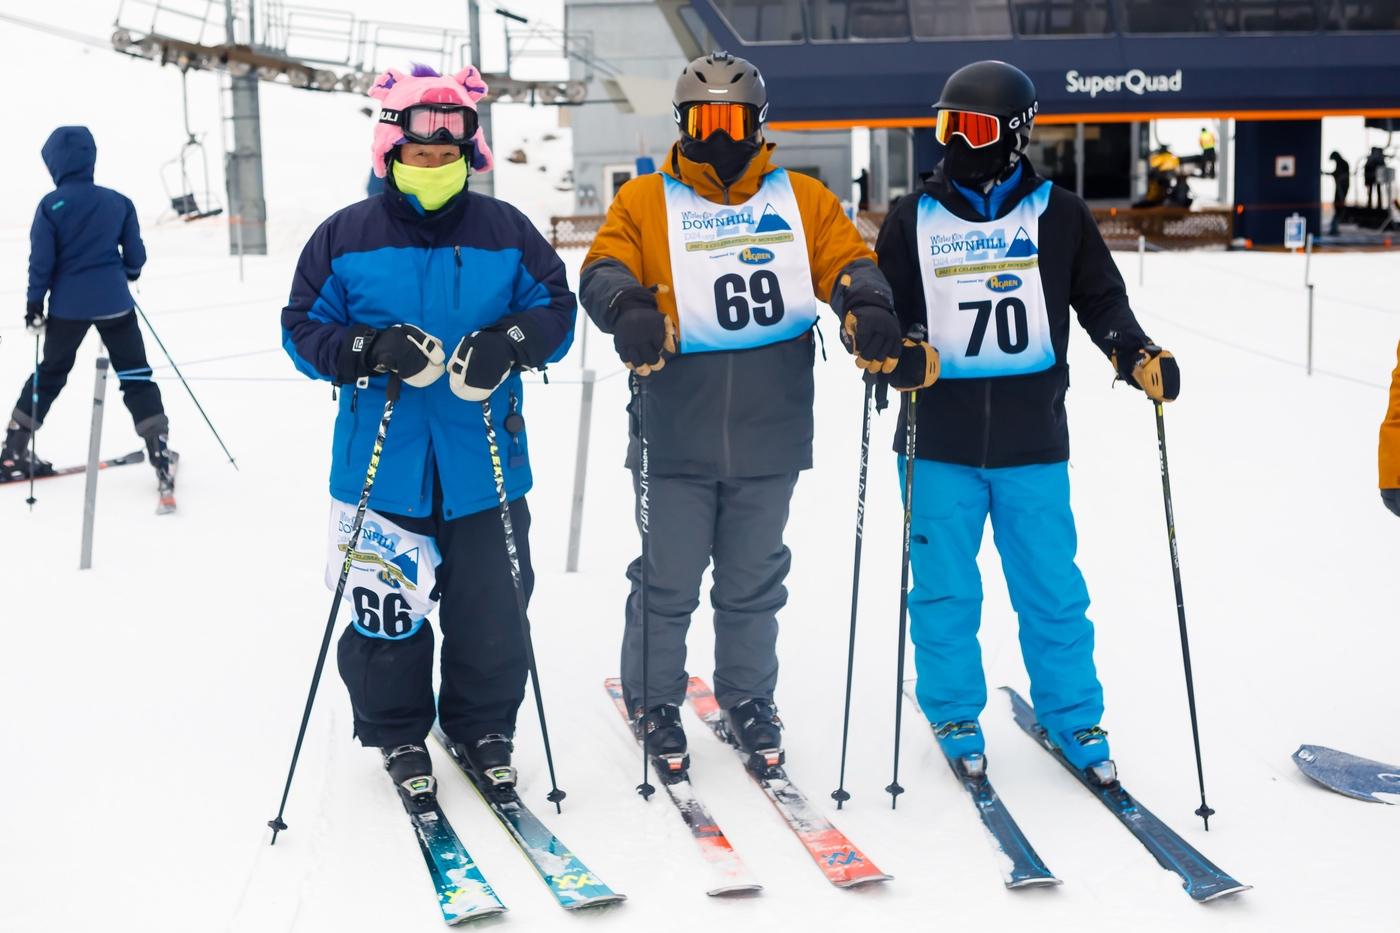 WinterKids Downhill 24 2021 SDP 2908